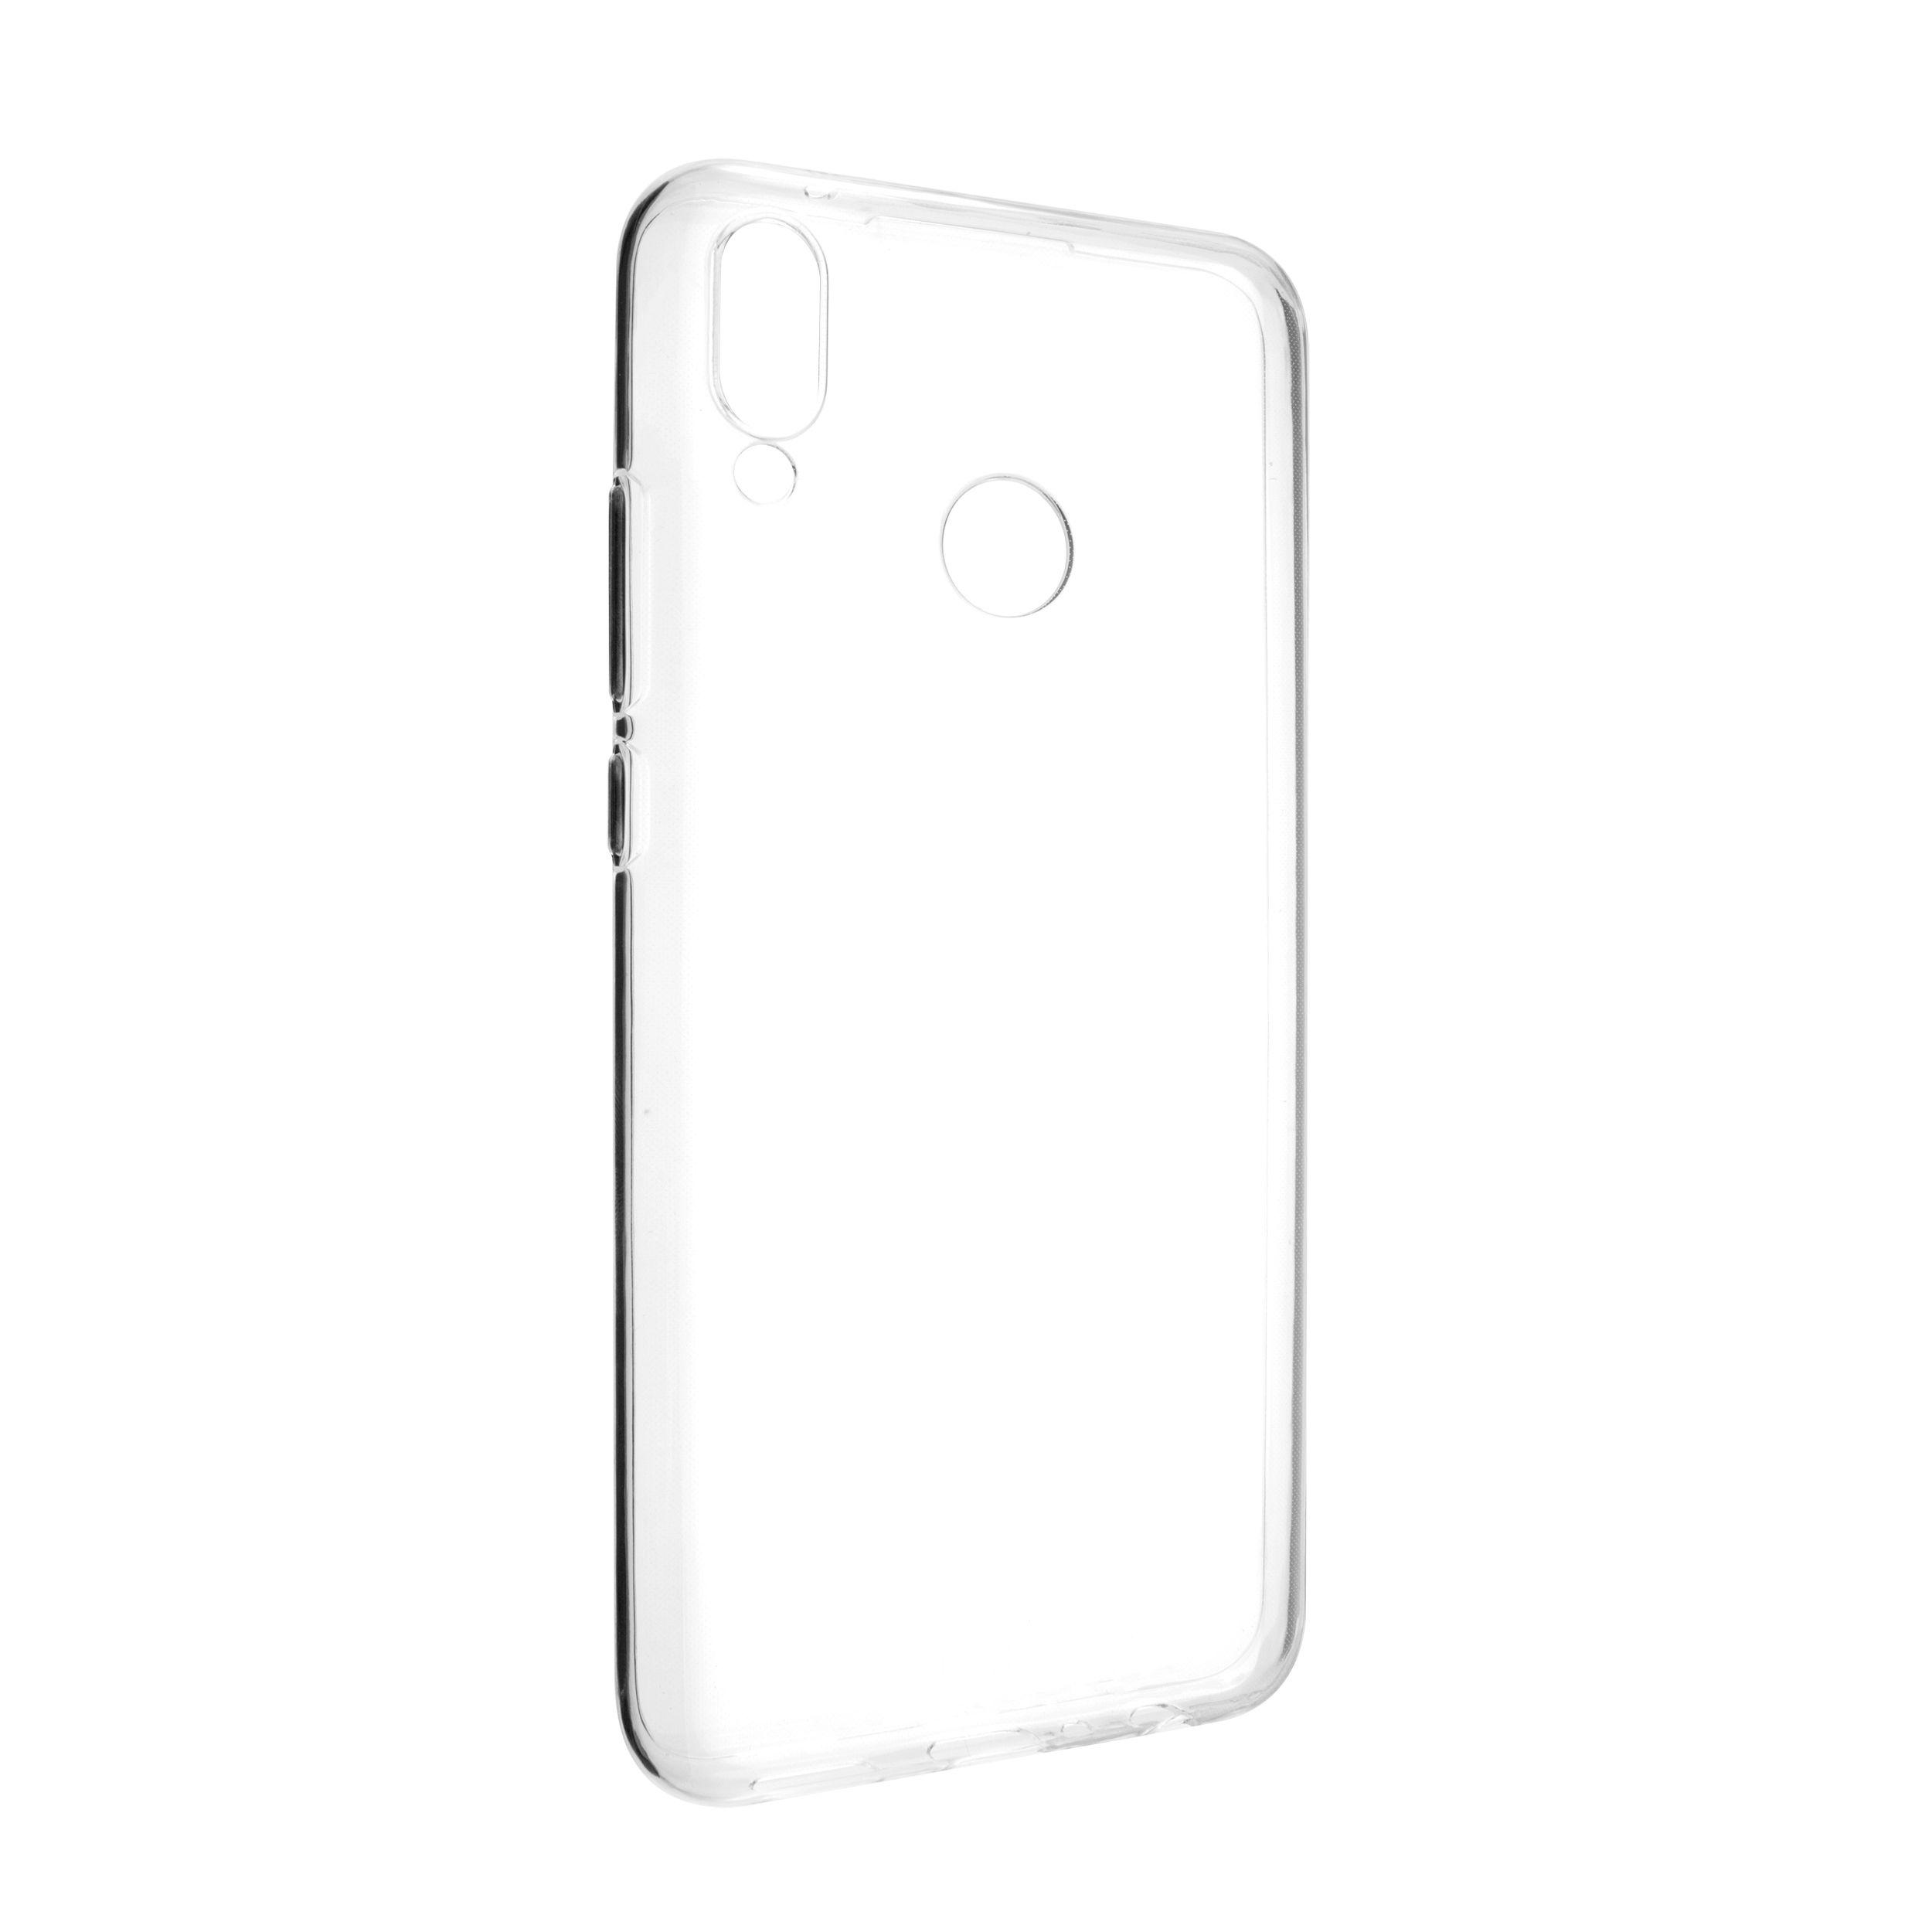 TPU gelové pouzdro FIXED pro Huawei Y9 (2019), čiré